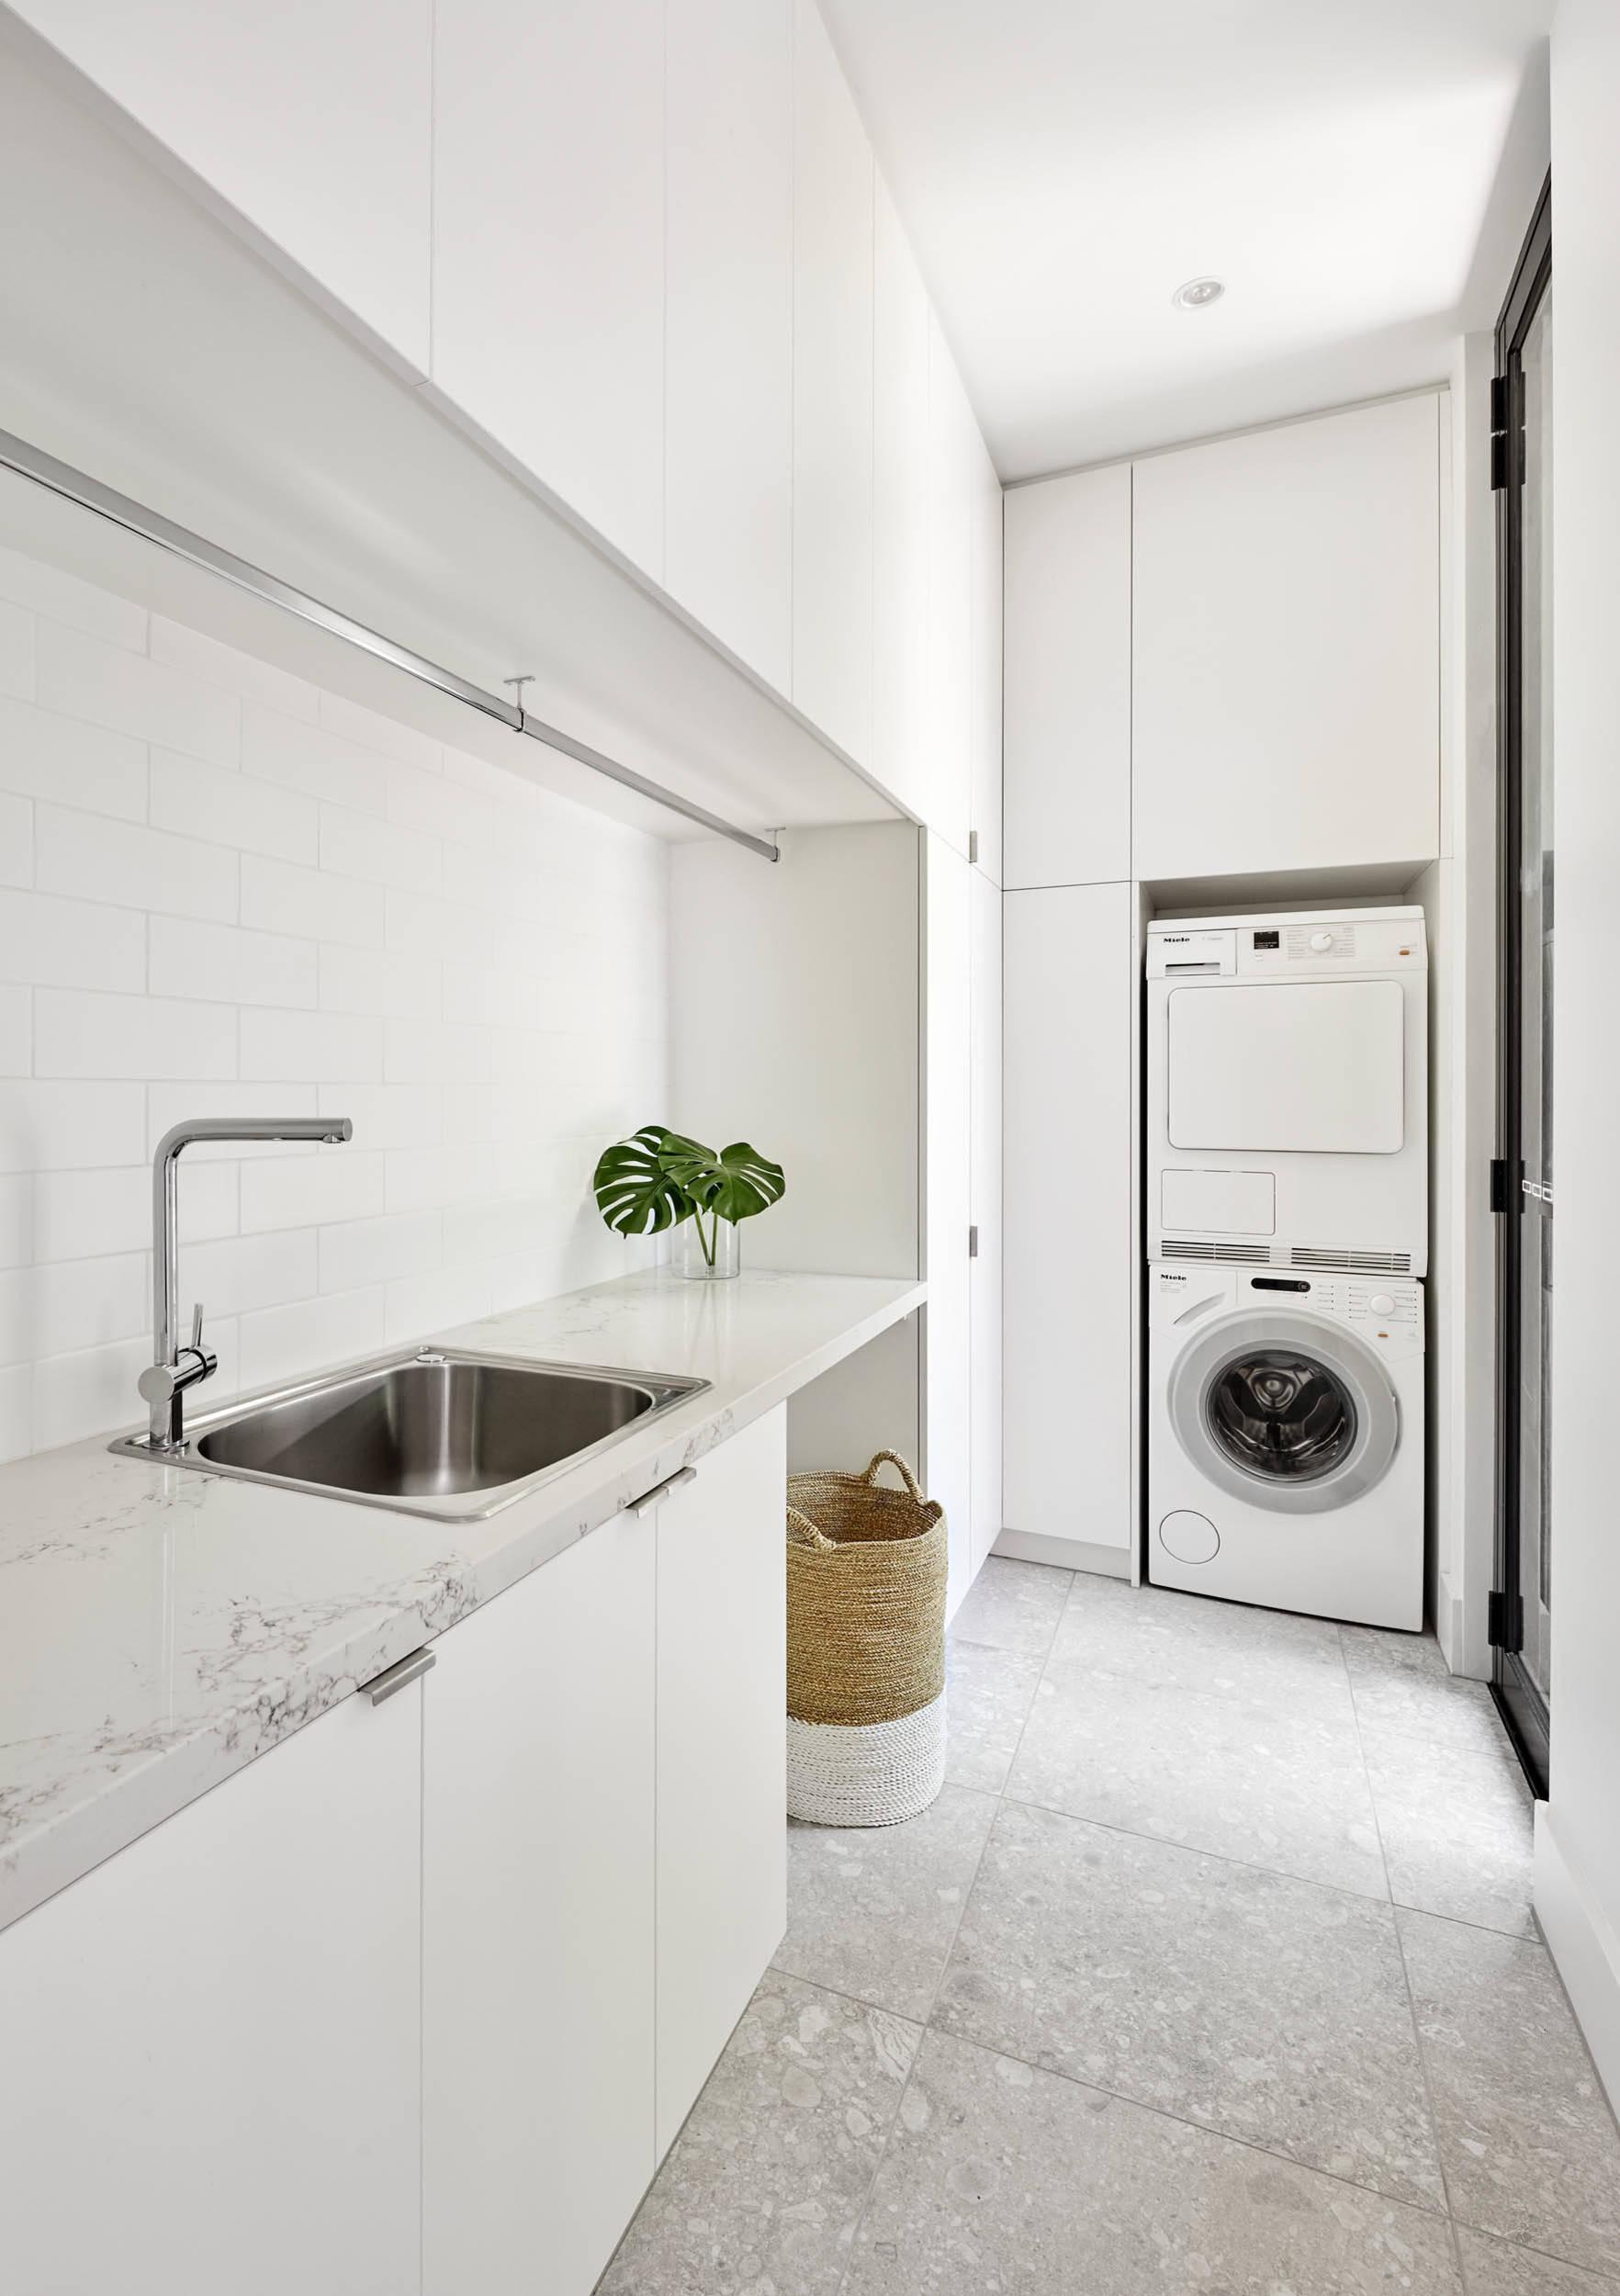 5x7 Laundry Room Ideas Photos Houzz